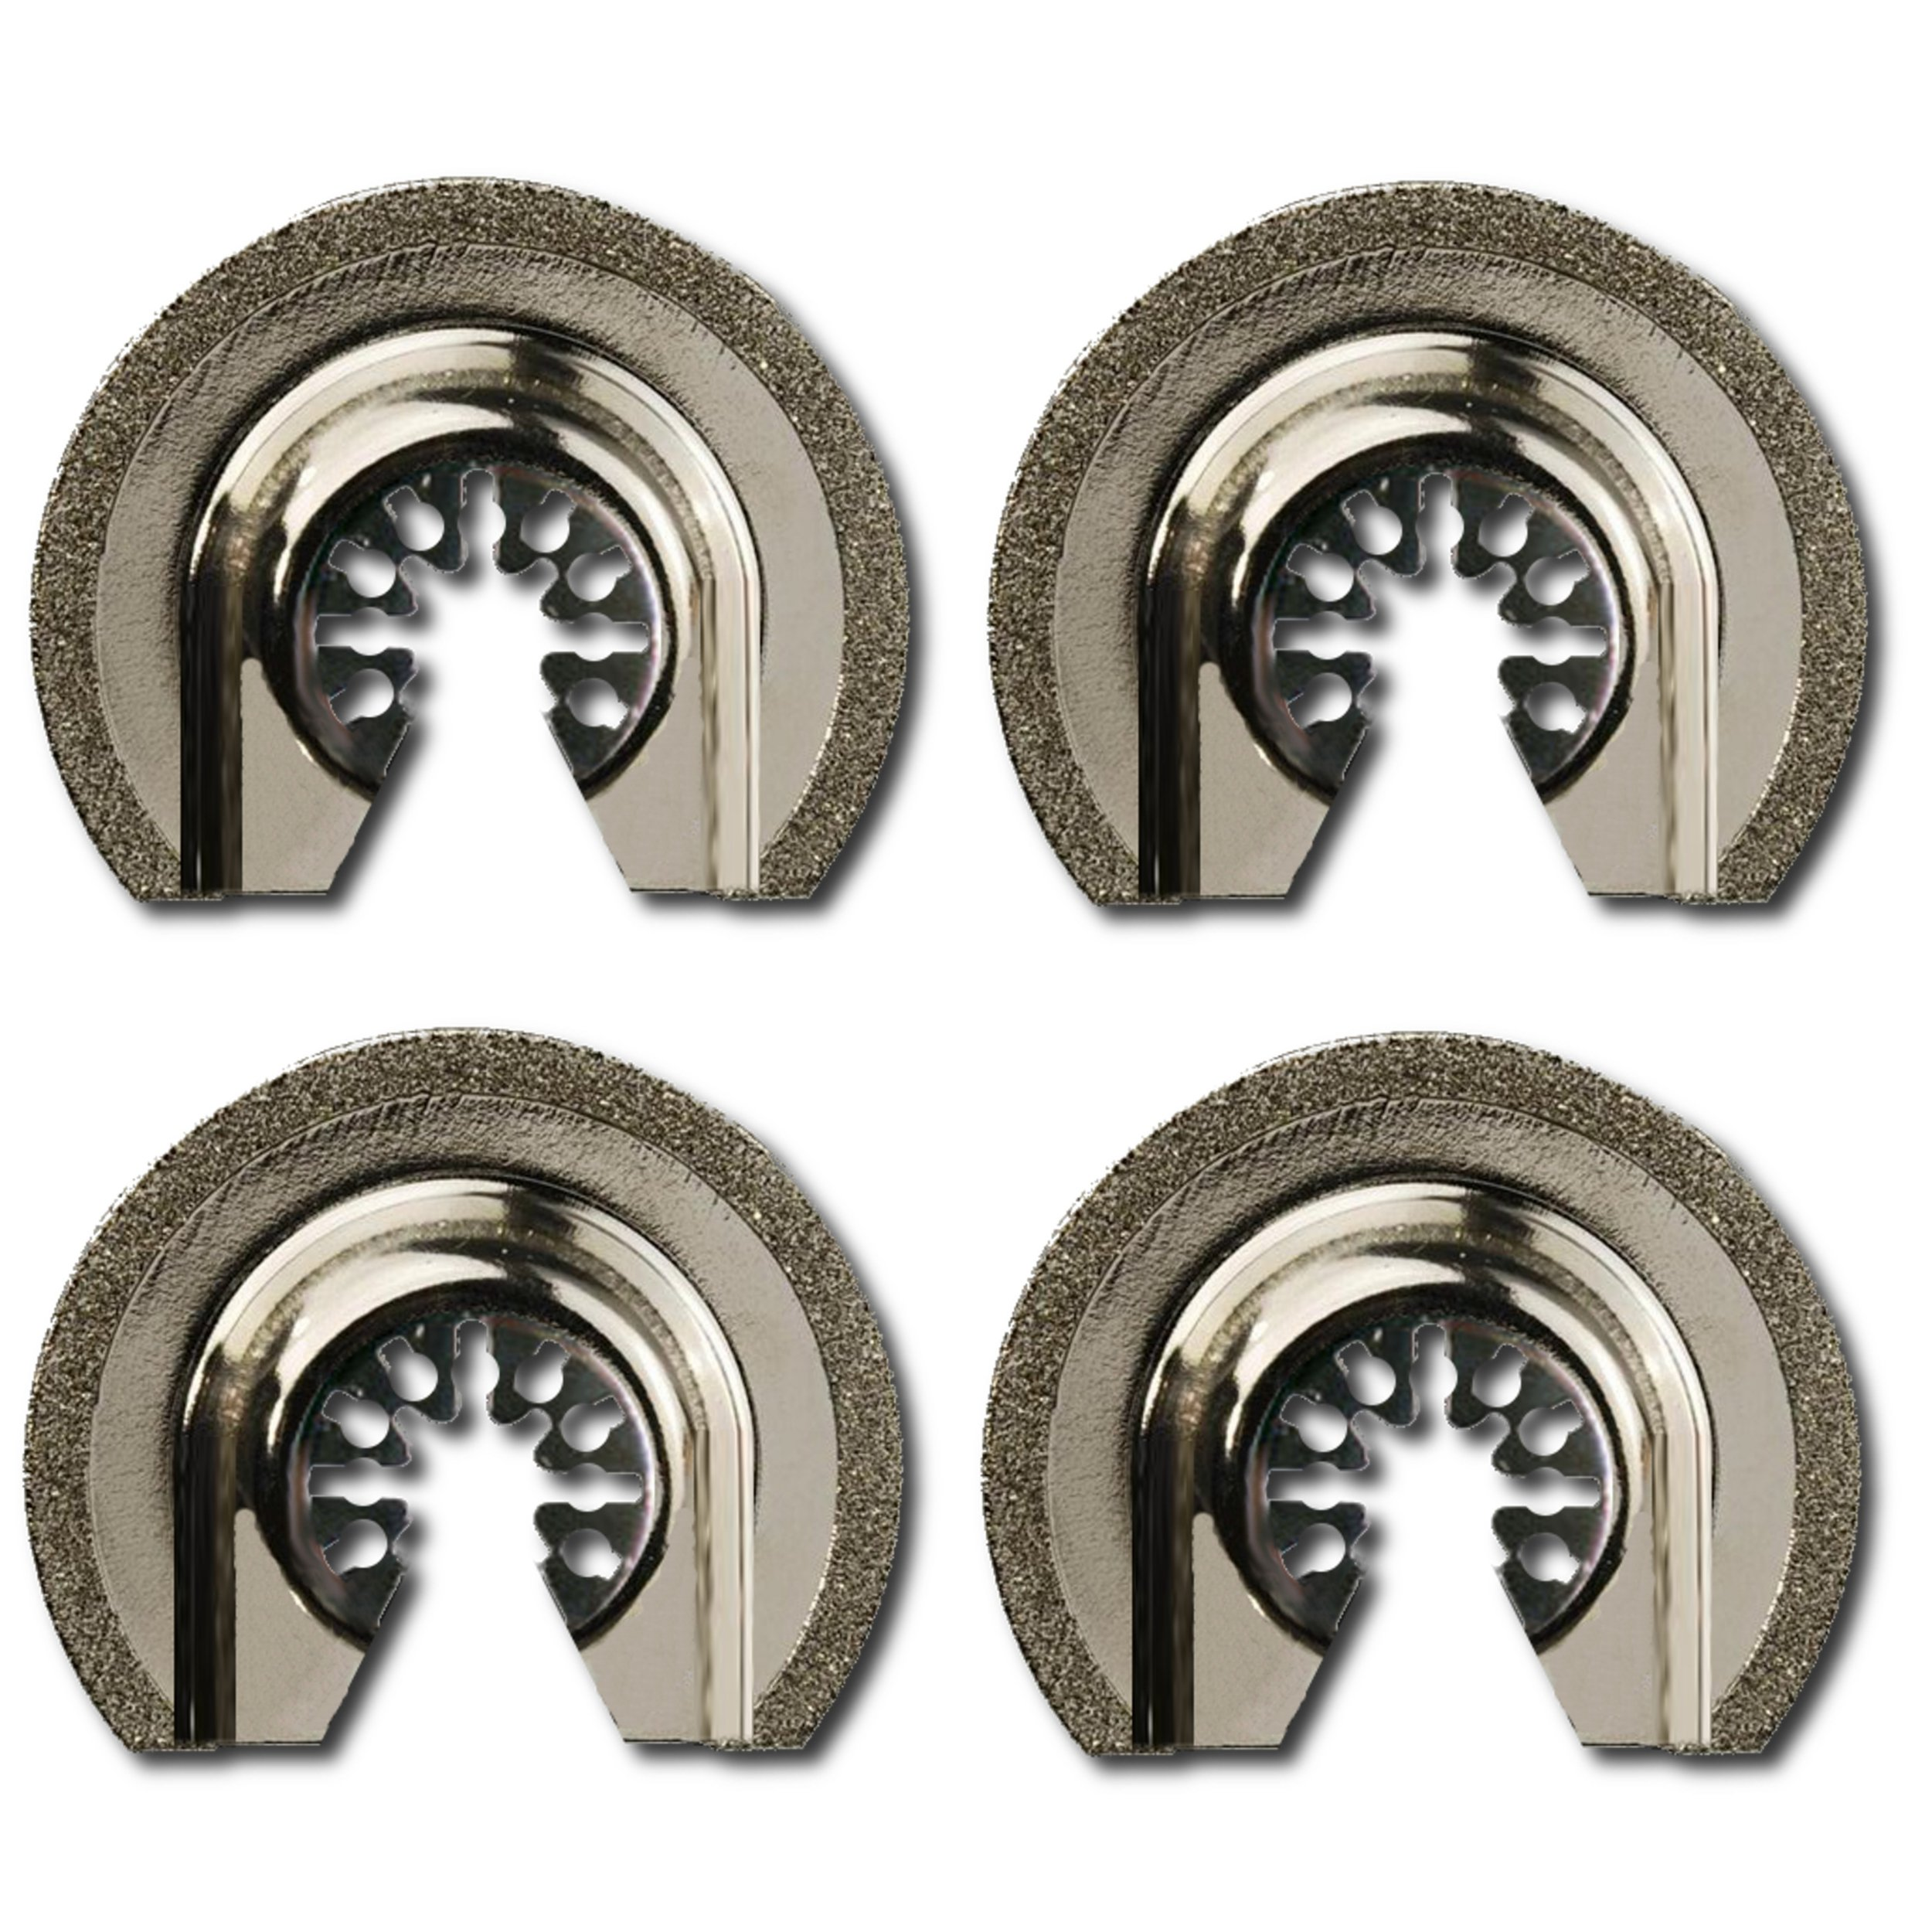 Integra Tools Platinum Series Blades P4DIA2.5 Semi-Round Flush Cut Universal Oscillating 2-1/2'' Diamond Grout Saw Blade (4-Items)